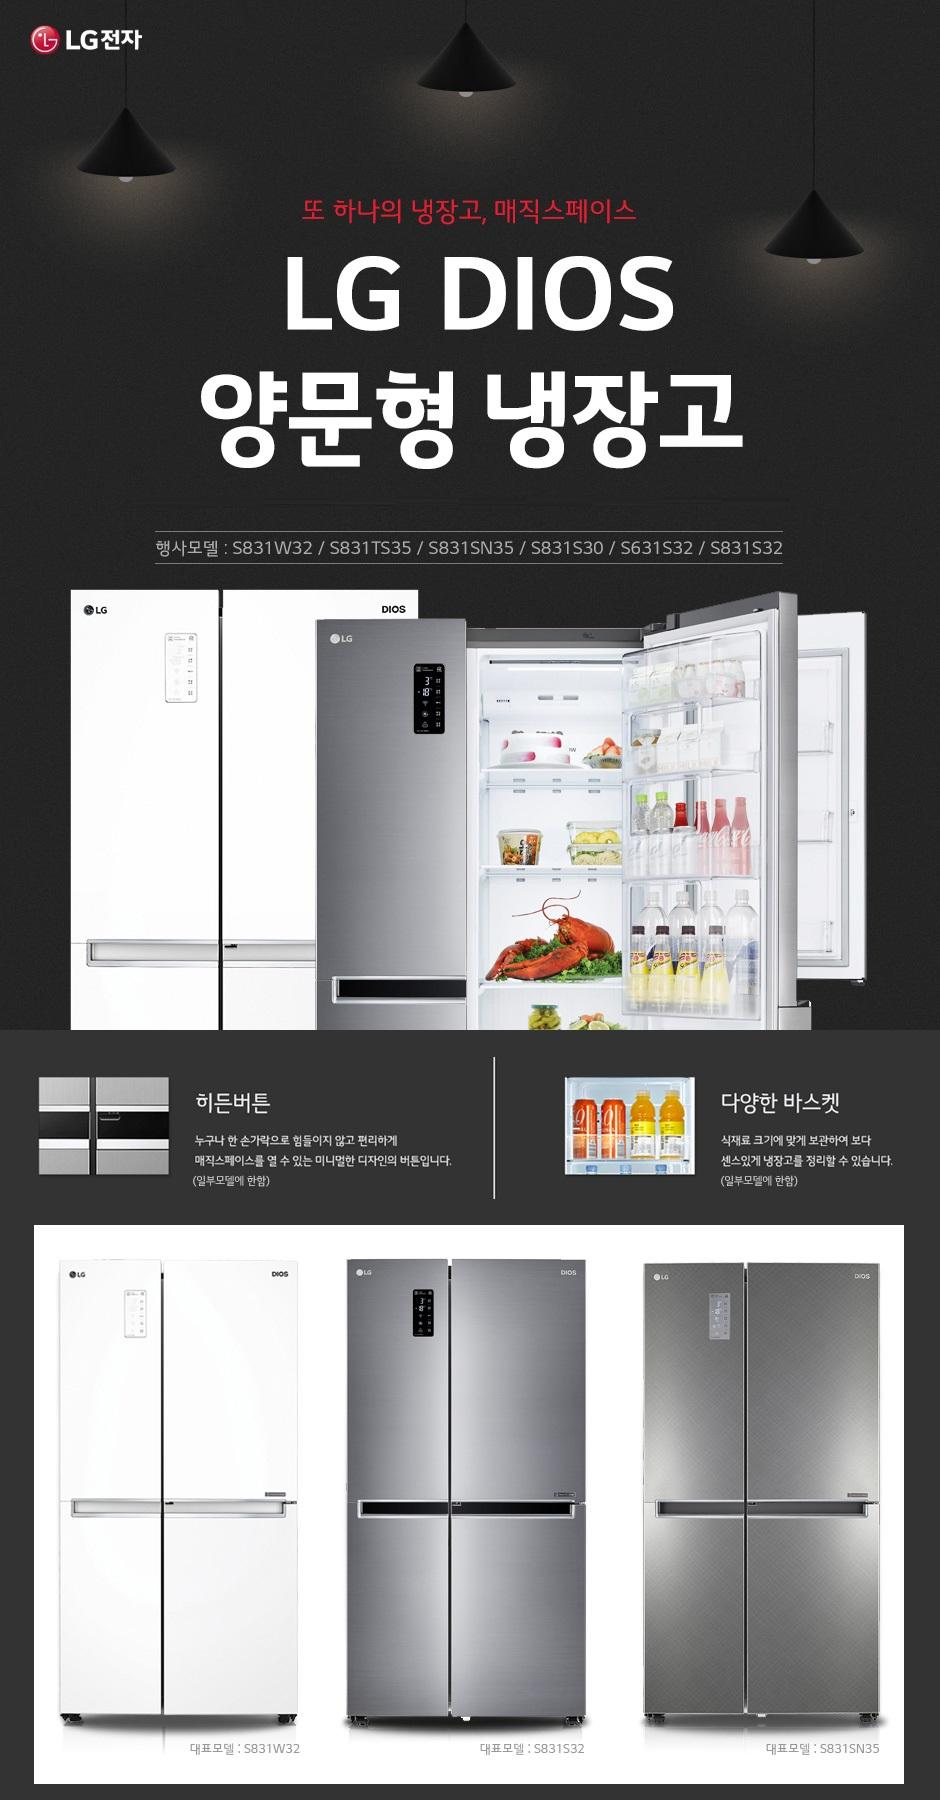 [LG전자] LG DIOS 양문형 냉장고 신모델 특가전